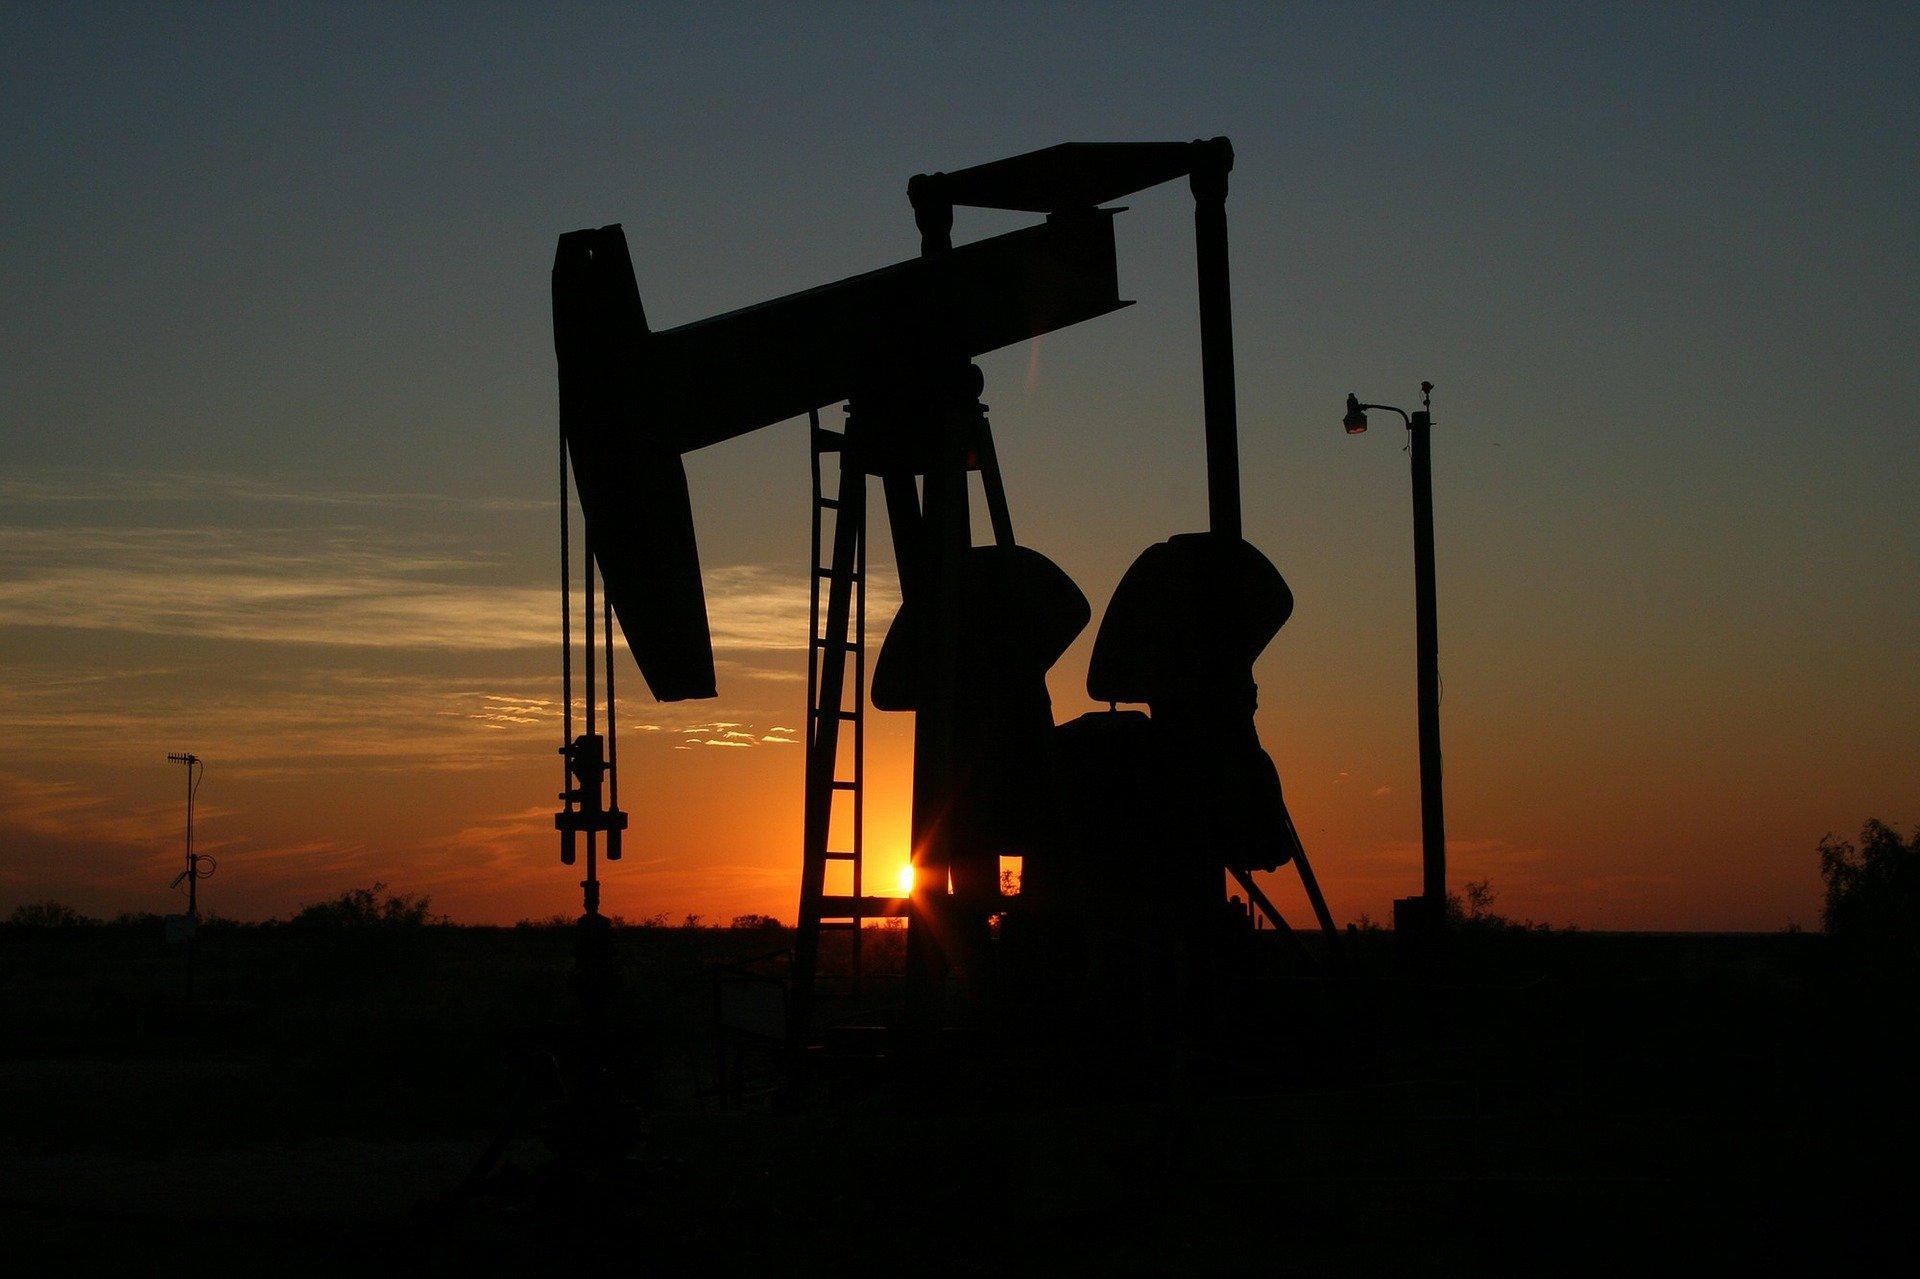 Oil under pressure